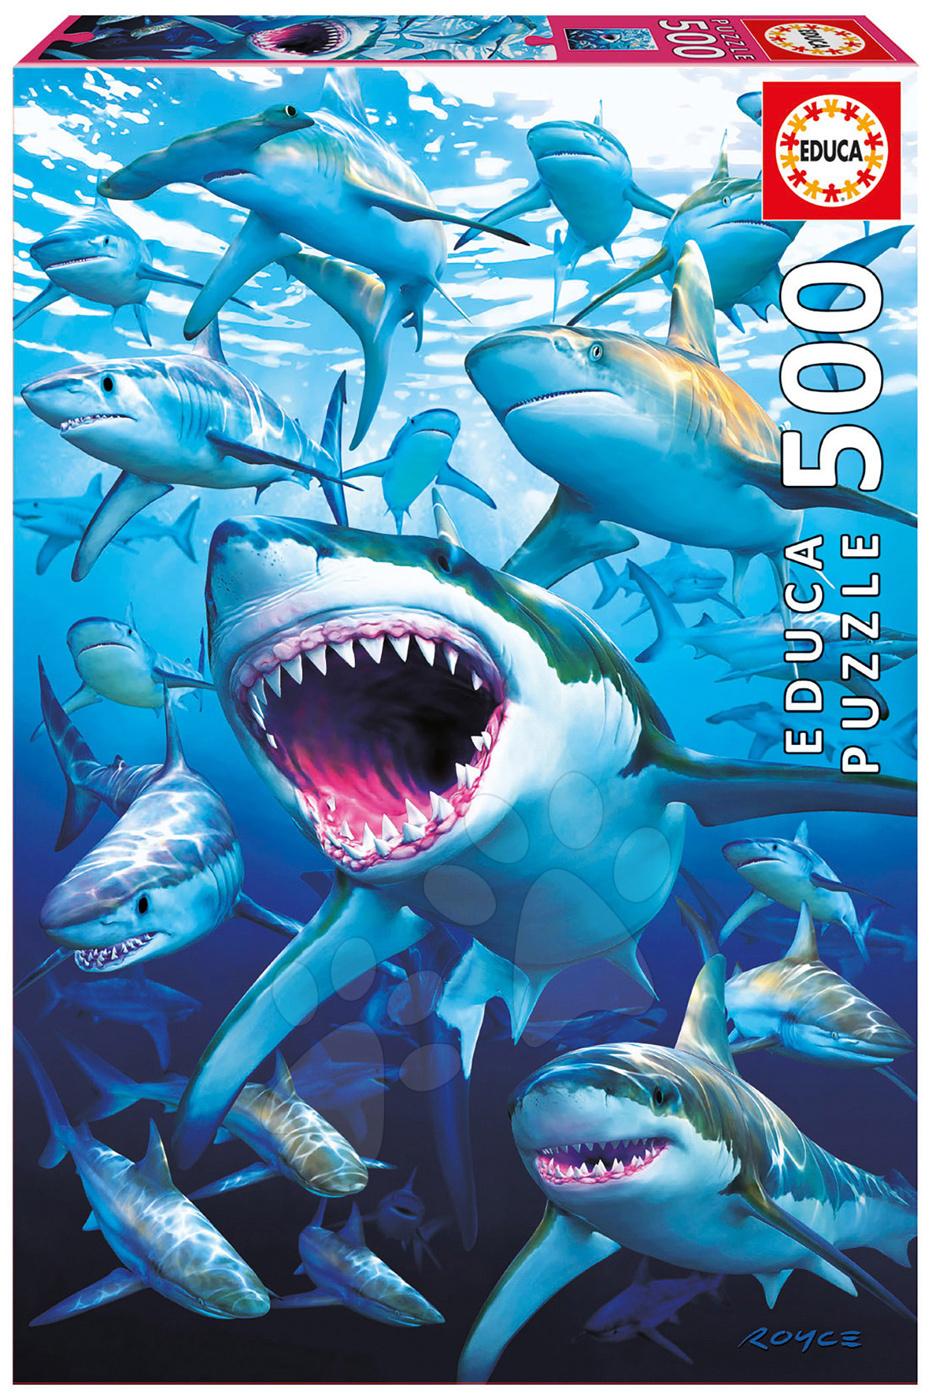 Puzzle Genuine Shark club Educa 500 dílků a Fix puzzle lepidlo od 11 let